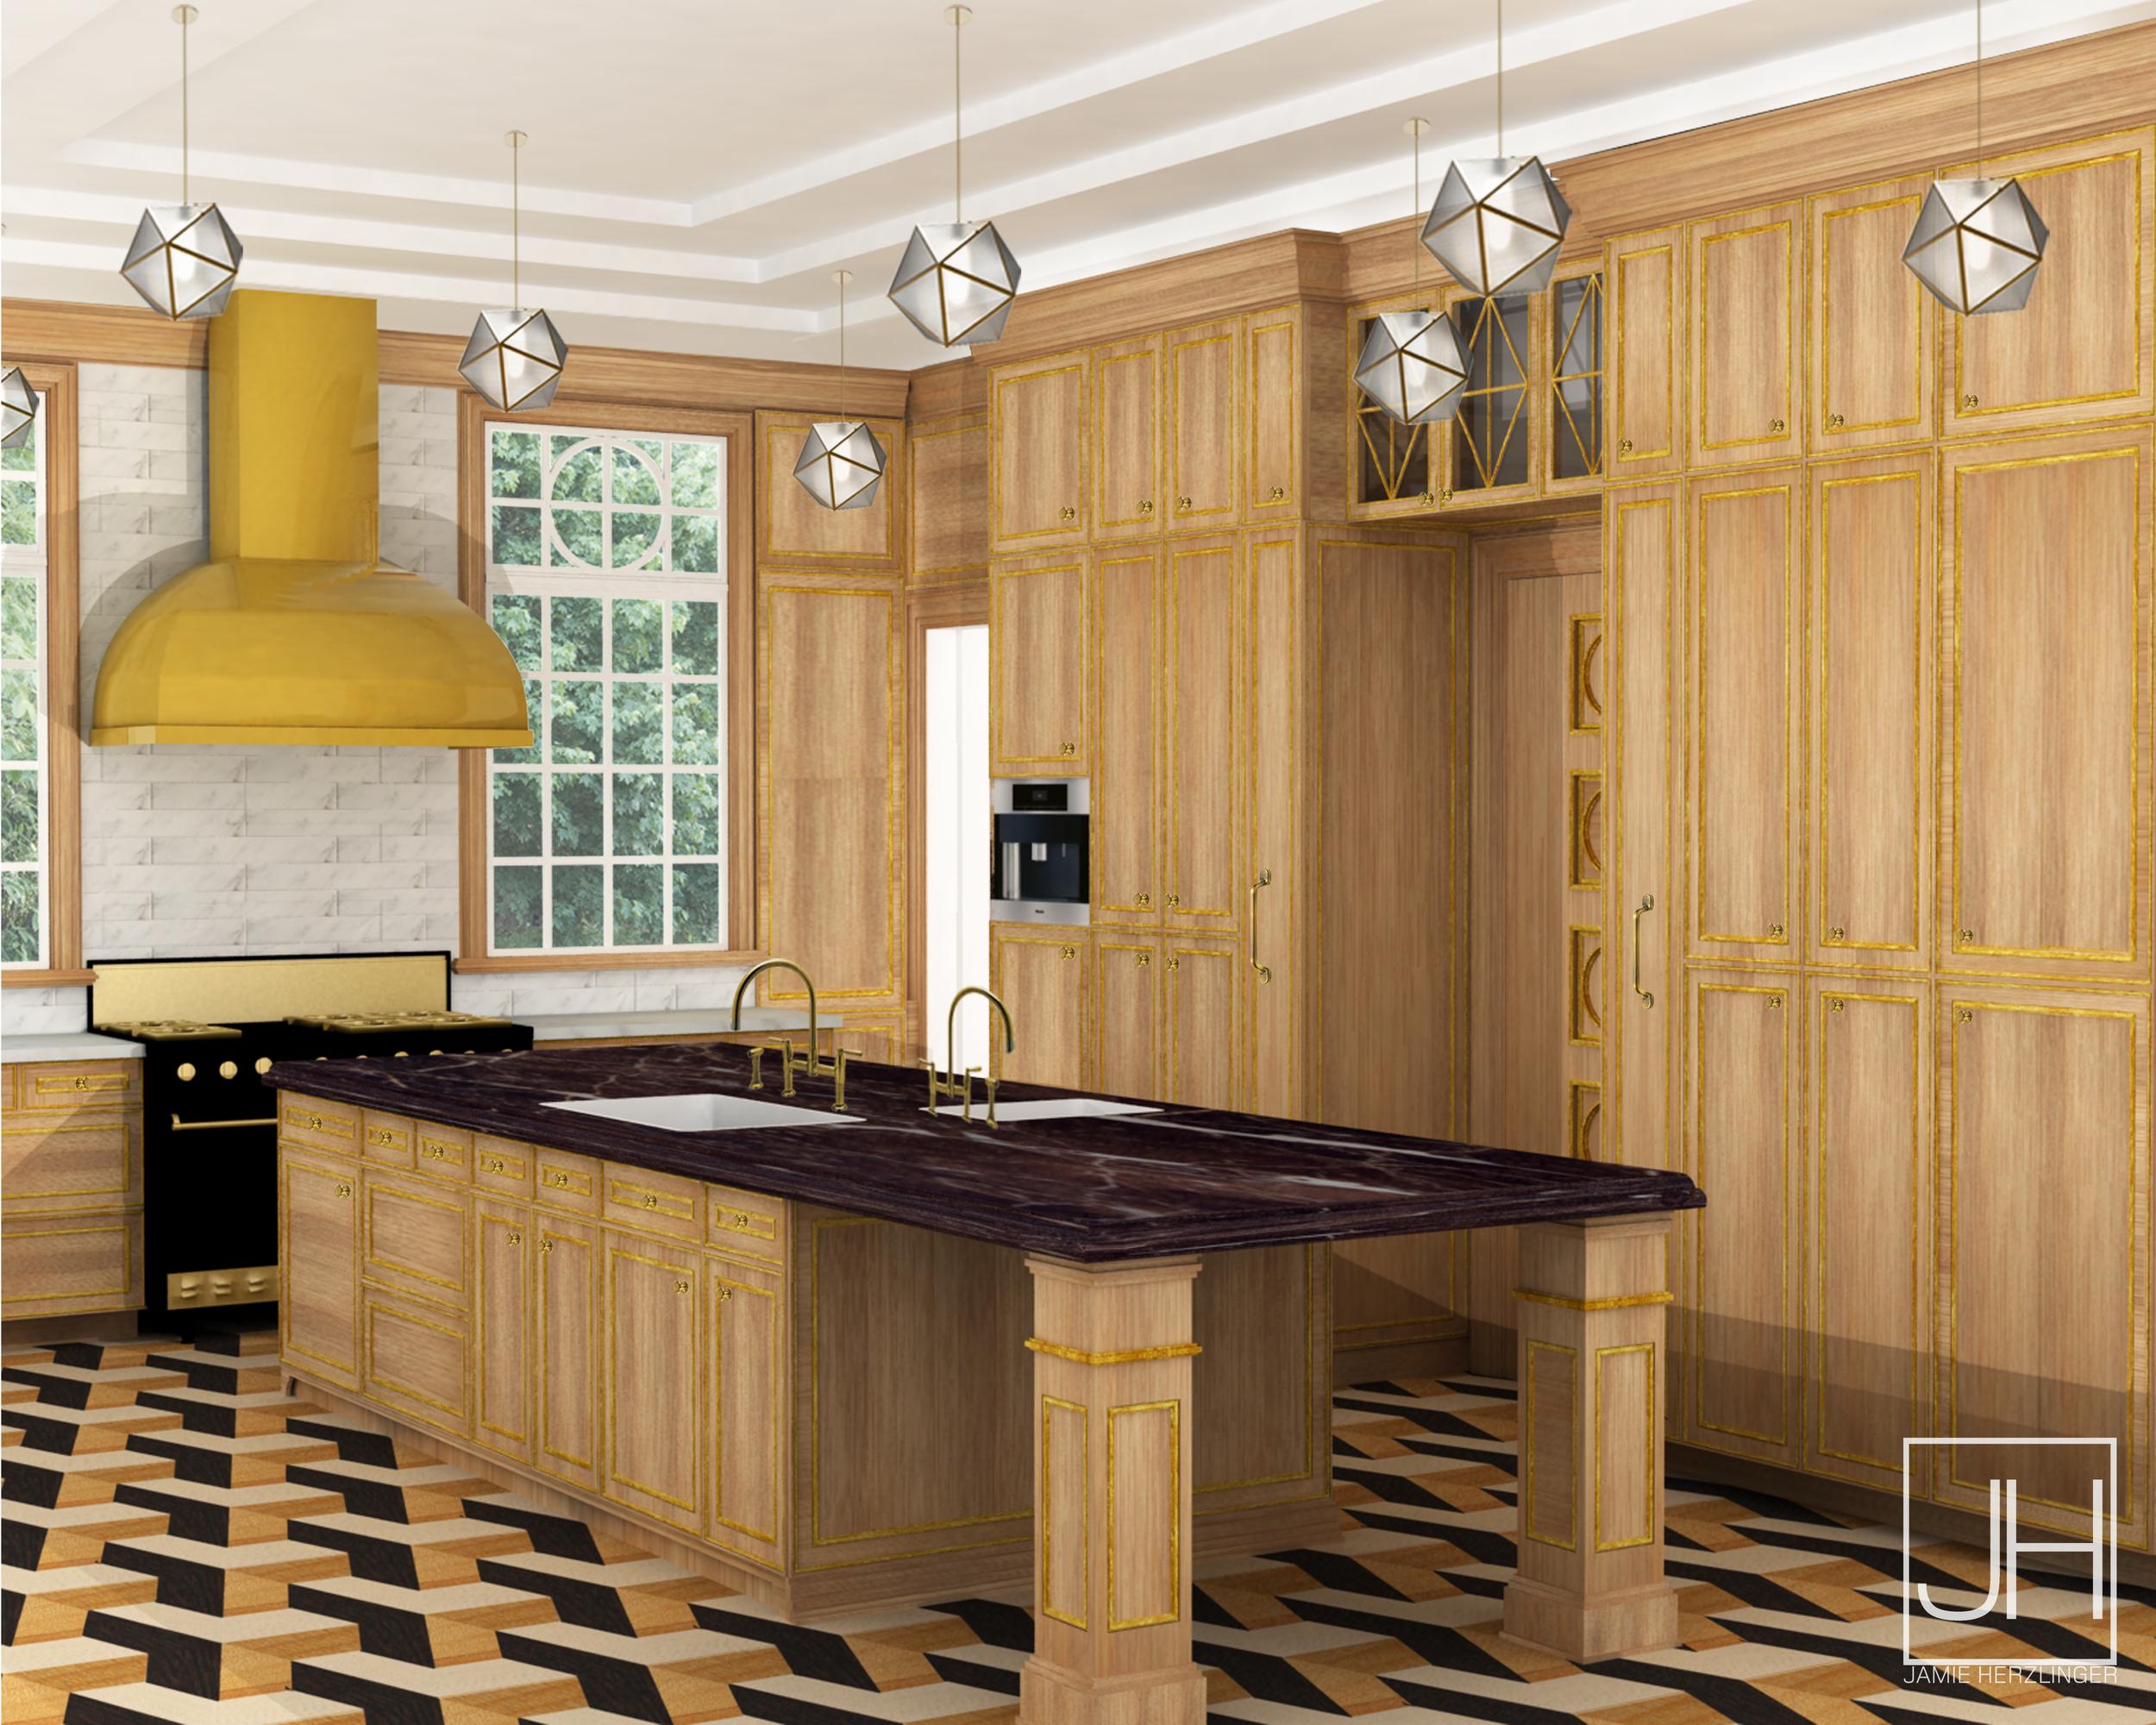 Gindi_Kitchen_Rift Oak view 2_090813.jpg